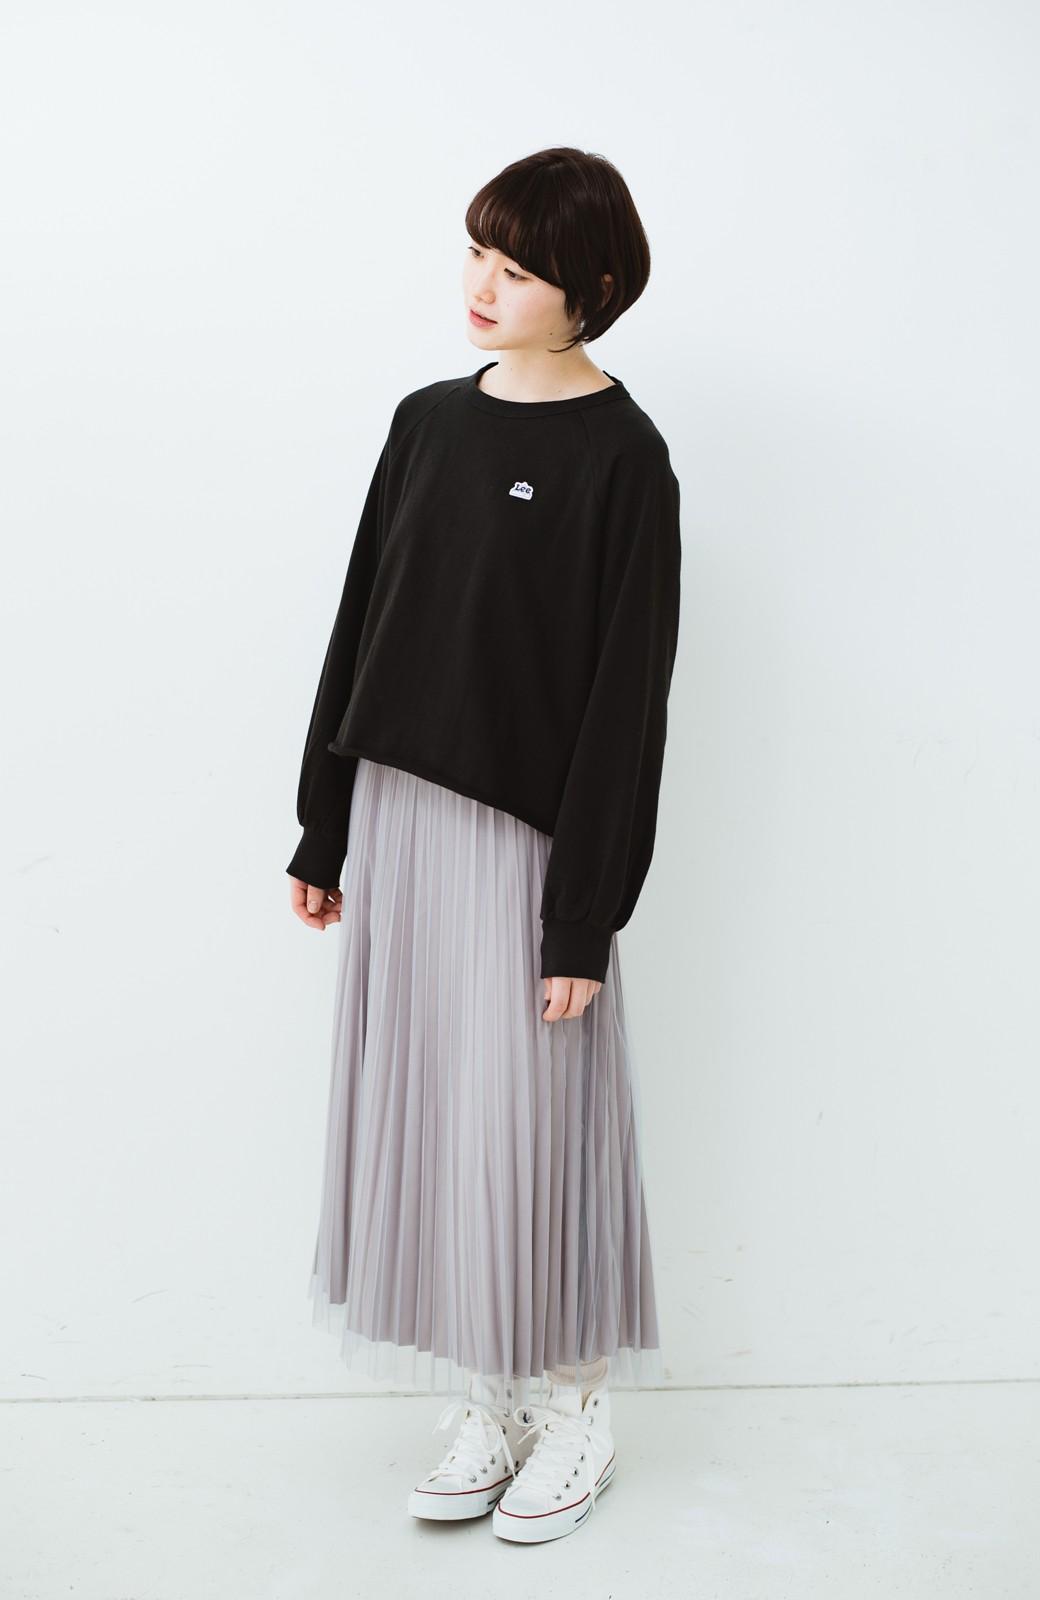 haco! どんな日も華やか気分にしてくれる 二枚仕立てのチュールプリーツスカート <ライトグレー>の商品写真12